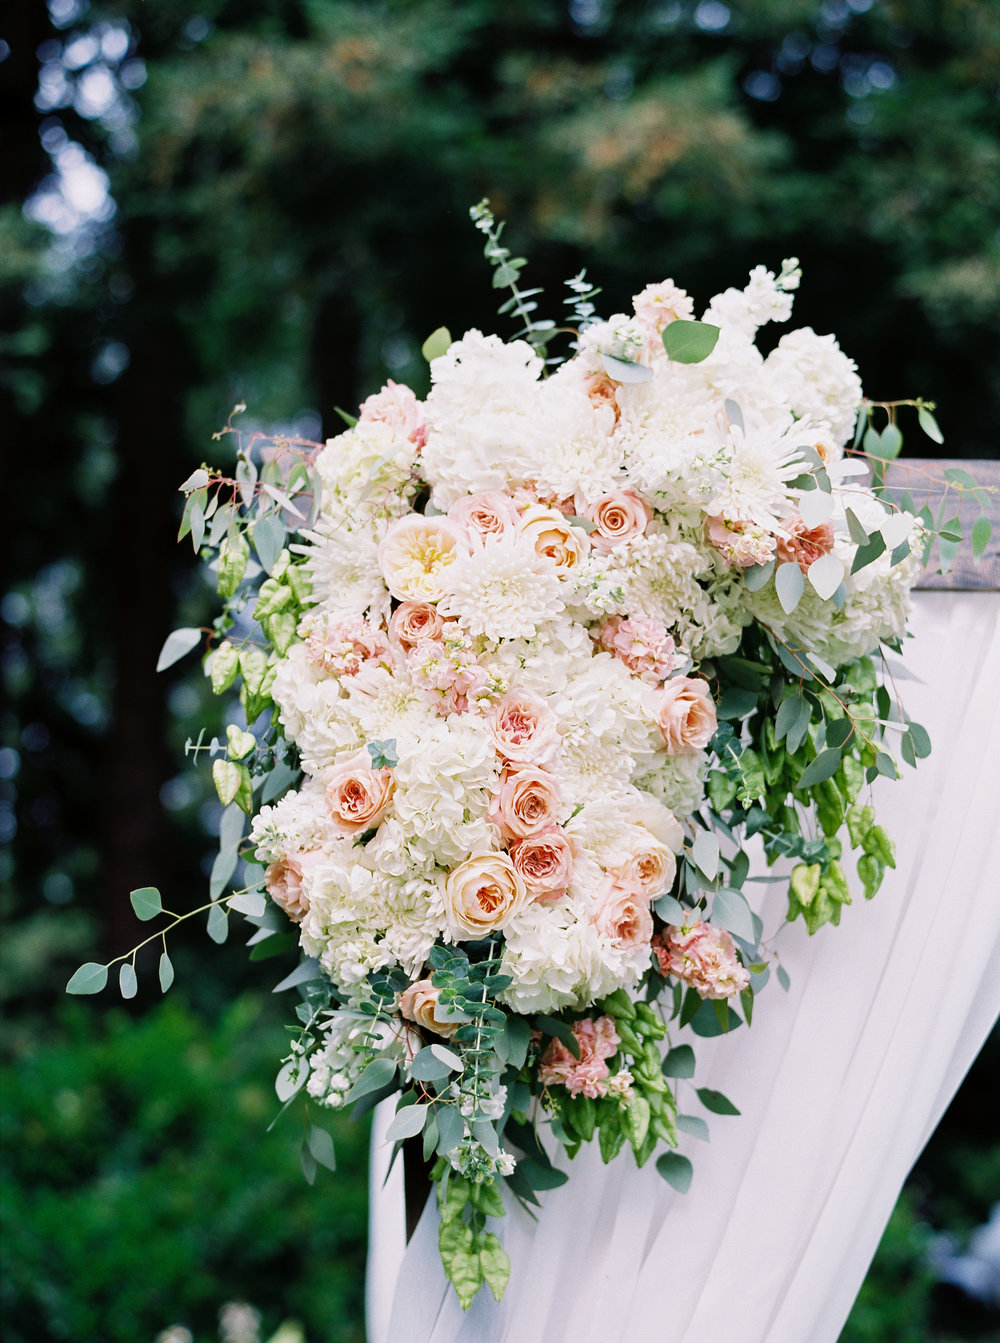 Harvest-inn-wedding-in-napa-california-219.jpg